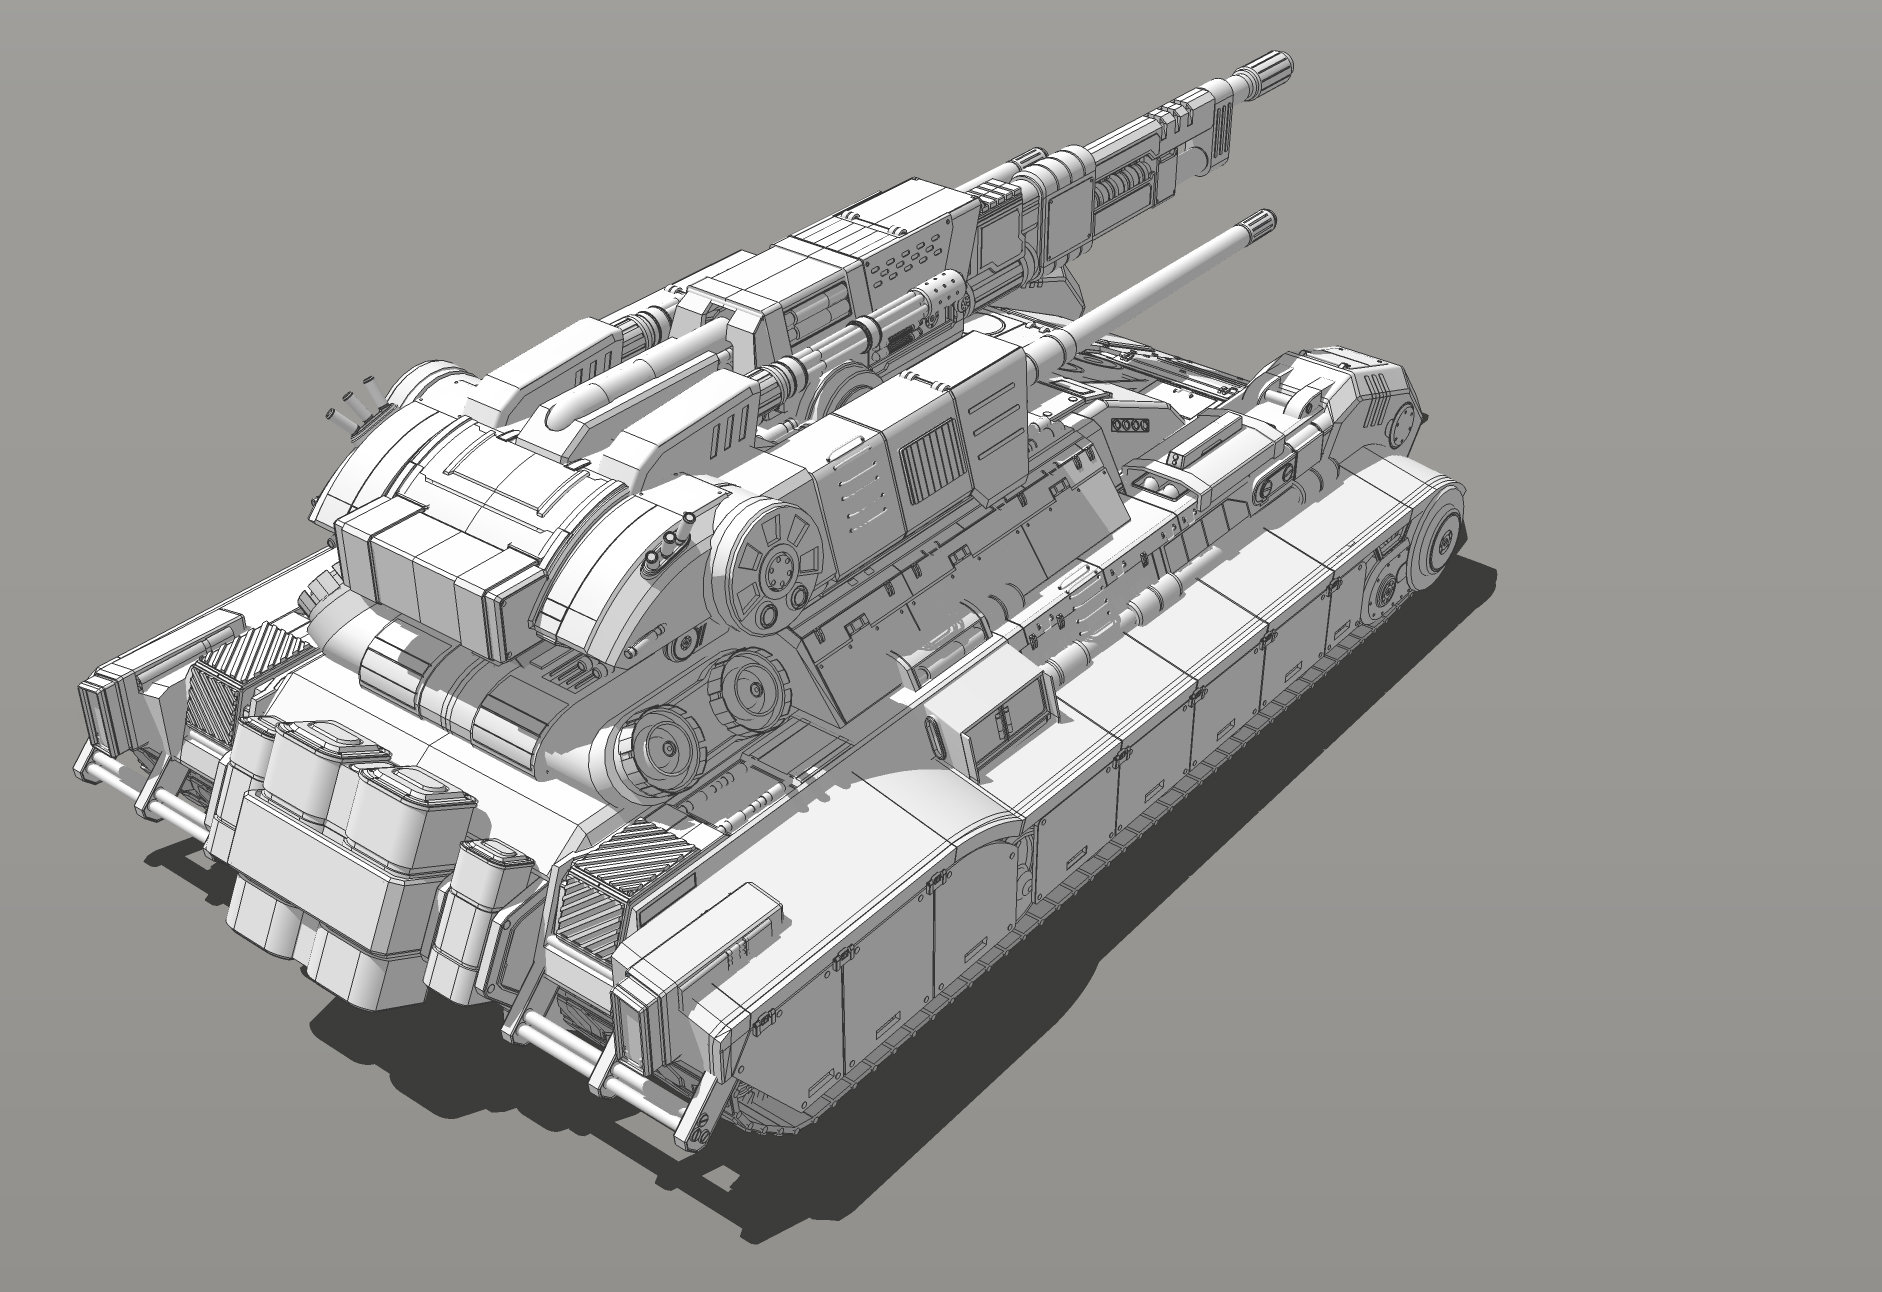 Muyoung kim armor grendal tank concept v6 kr 5